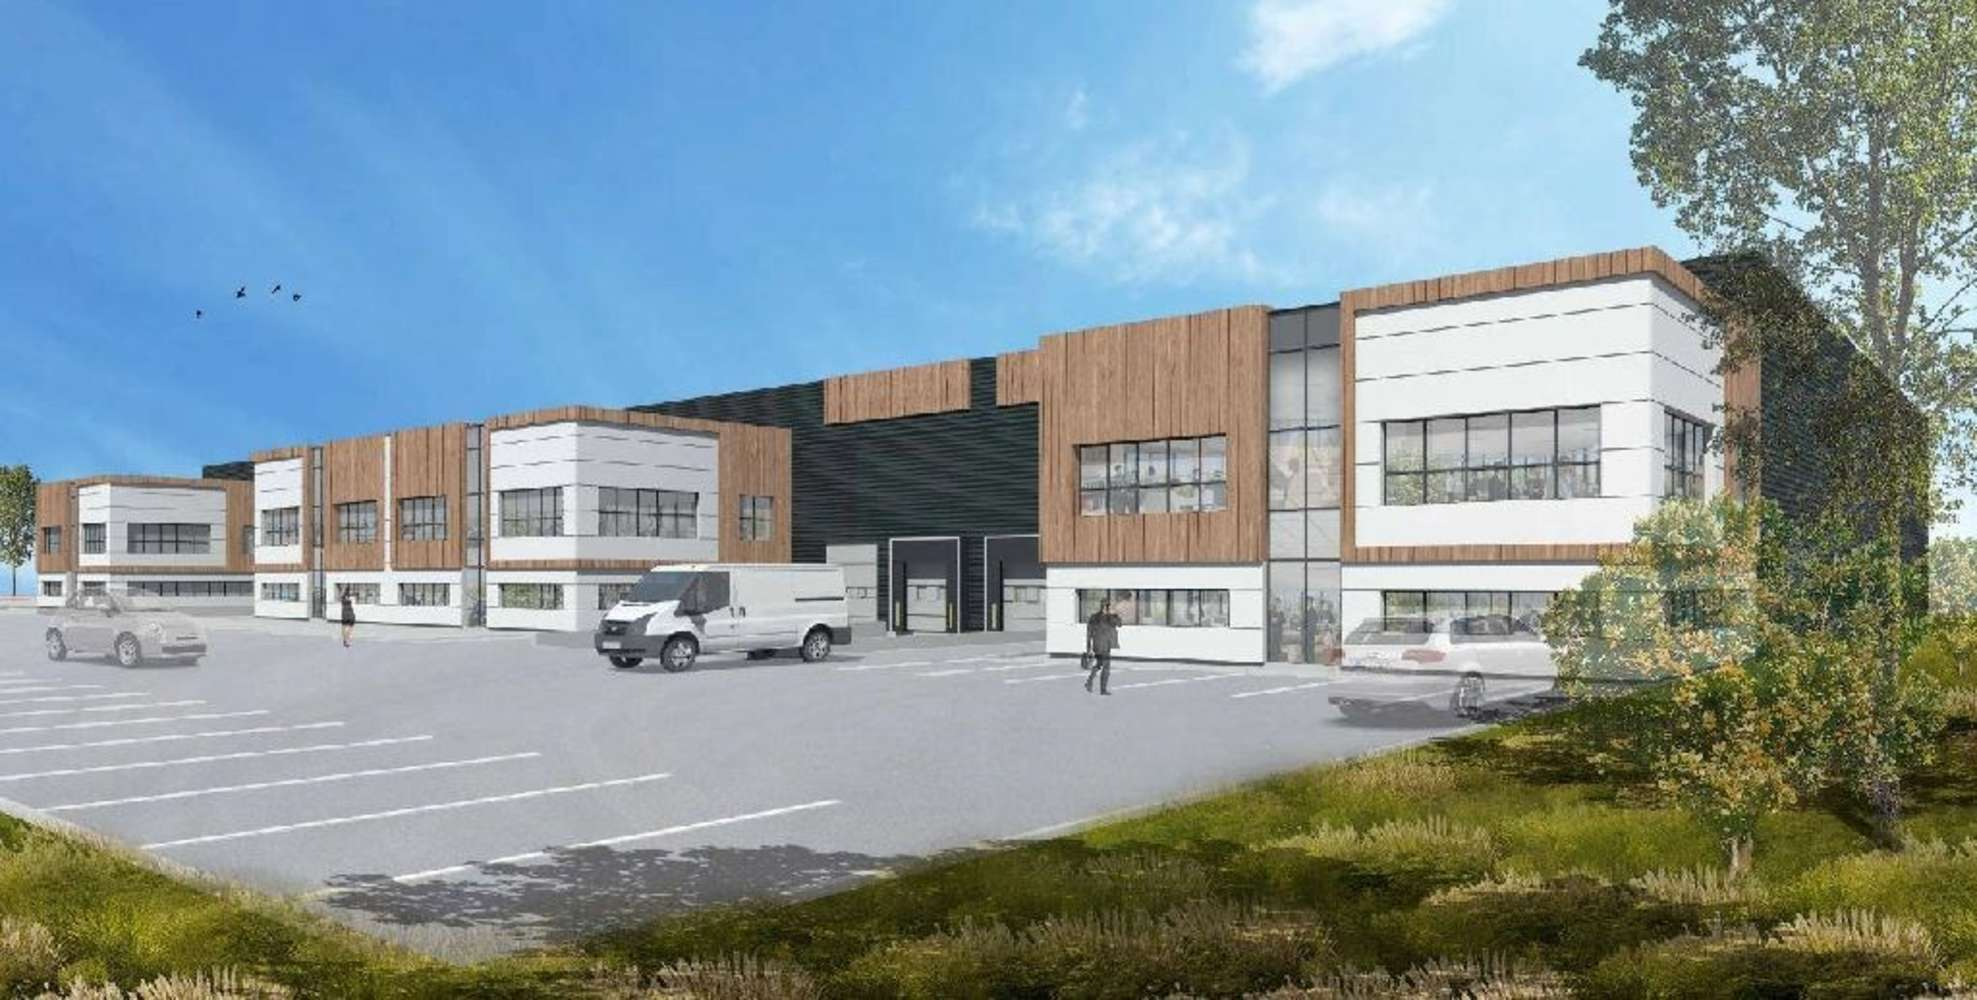 Activités/entrepôt Roissy en france, 95700 - SEGRO BUSINESS PARK - 9773954